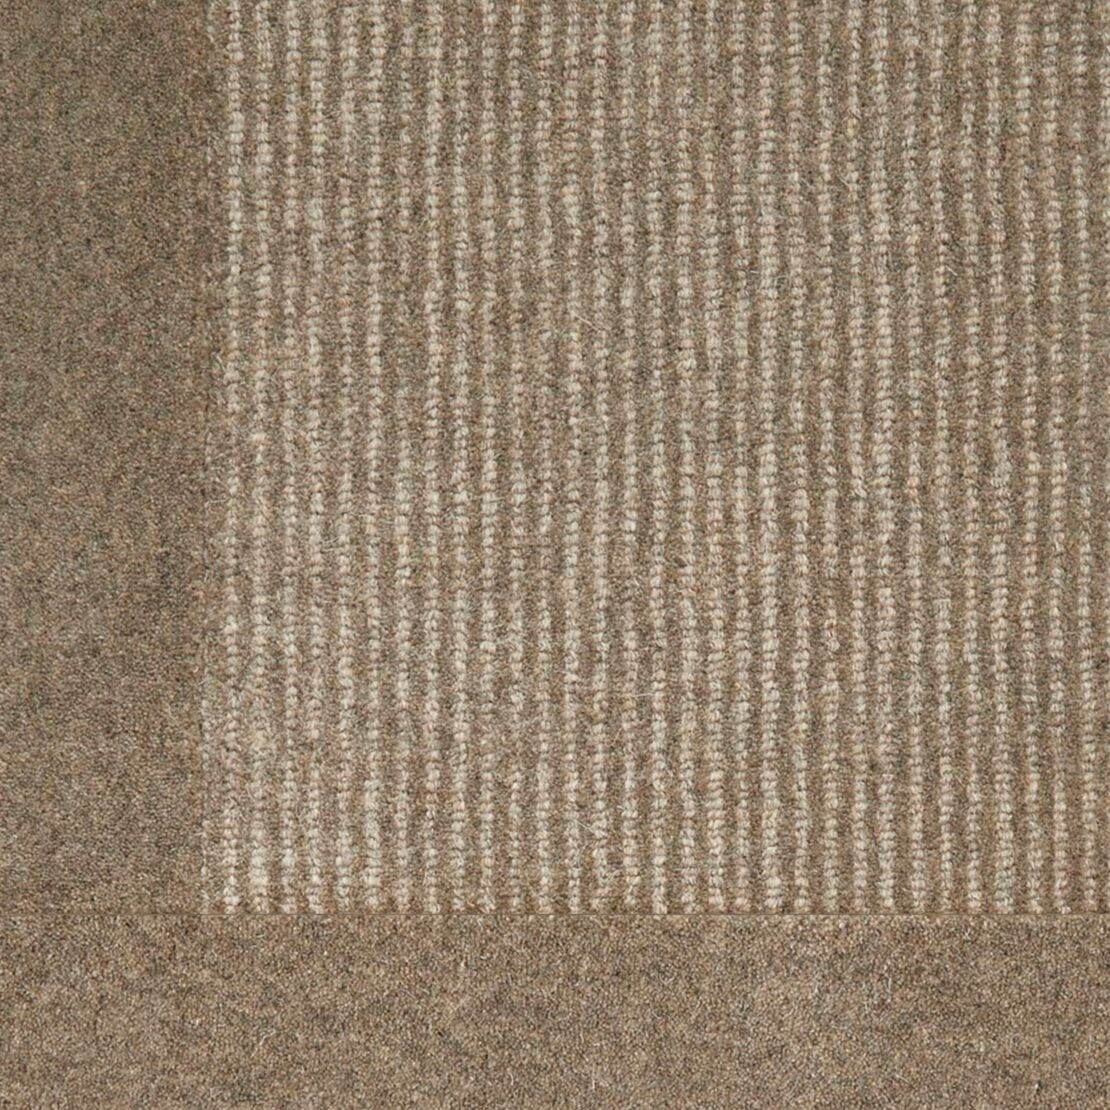 Kleinschmidt Hand-Woven Wool Pebble Area Rug Size: Rectangle 6' x 9'